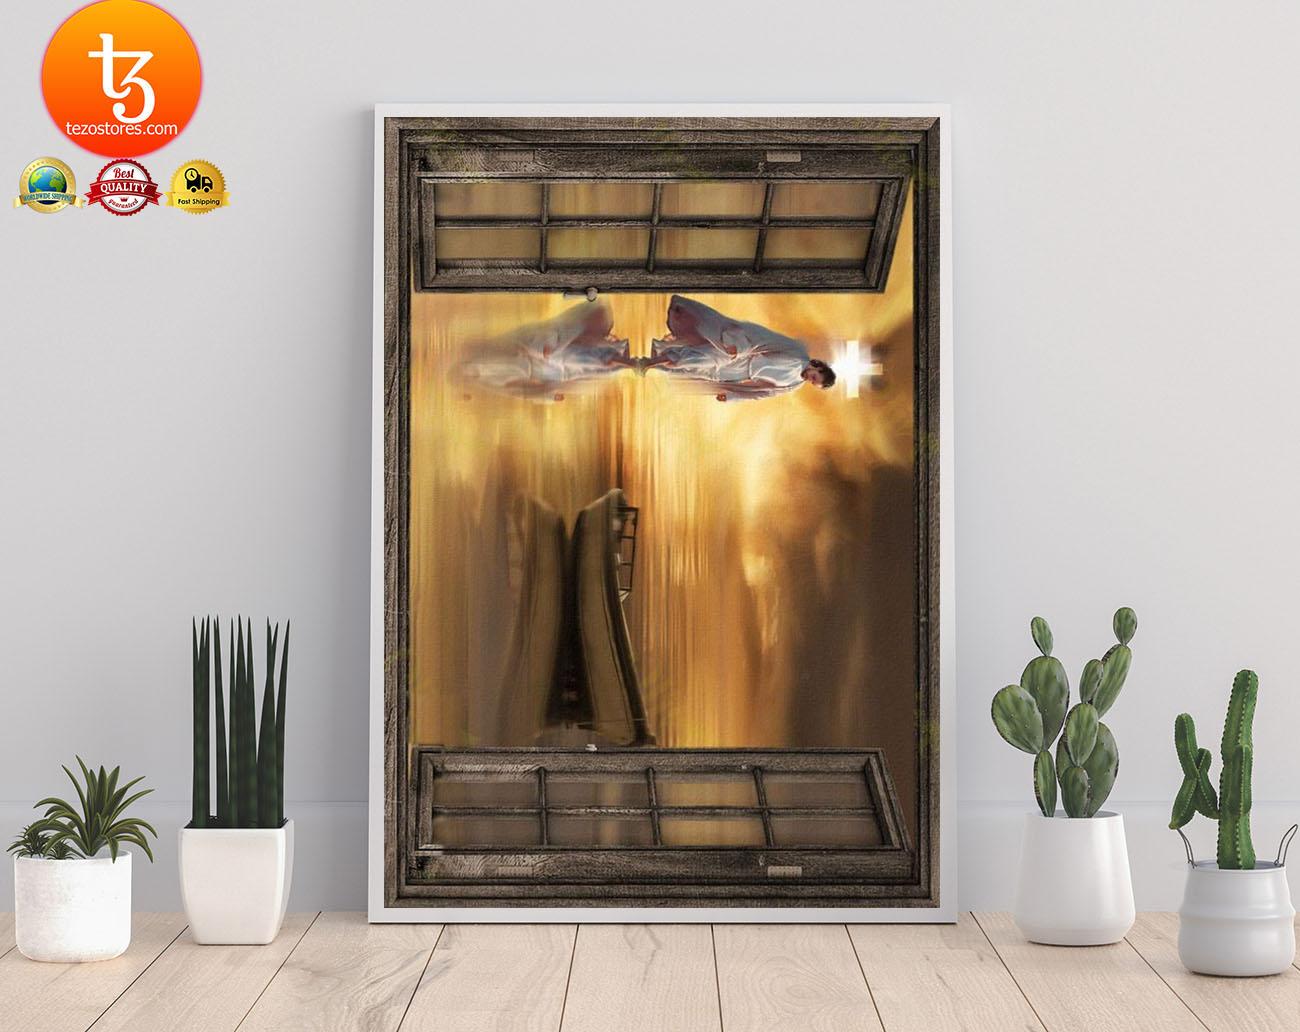 Jesus through the window poster 17